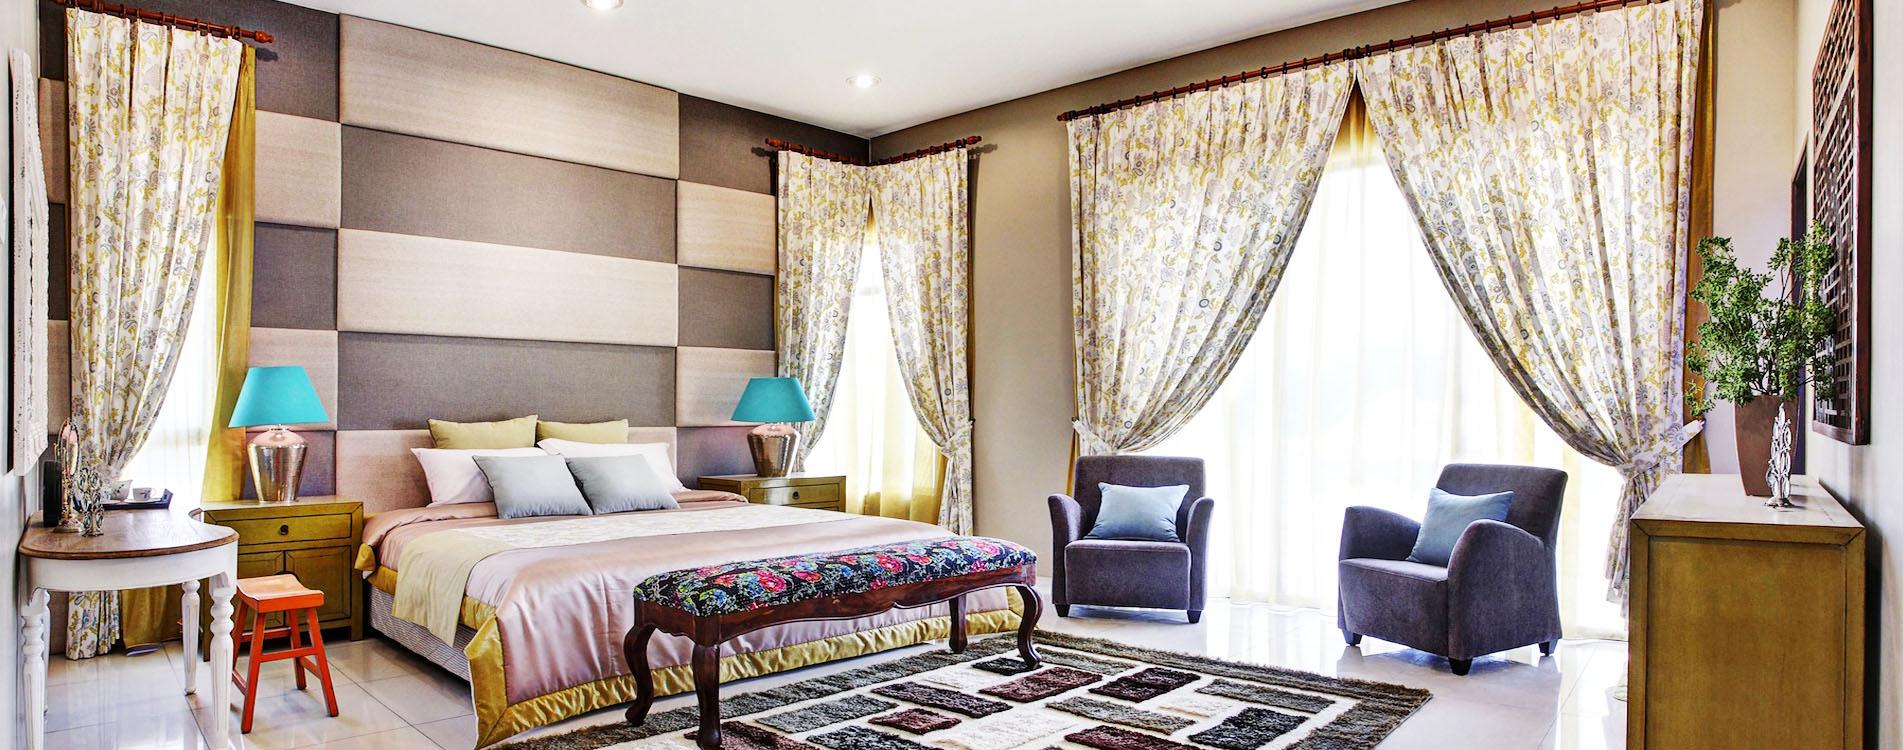 World Of Curtains Dubai Curtains Furniture Home Decor Products